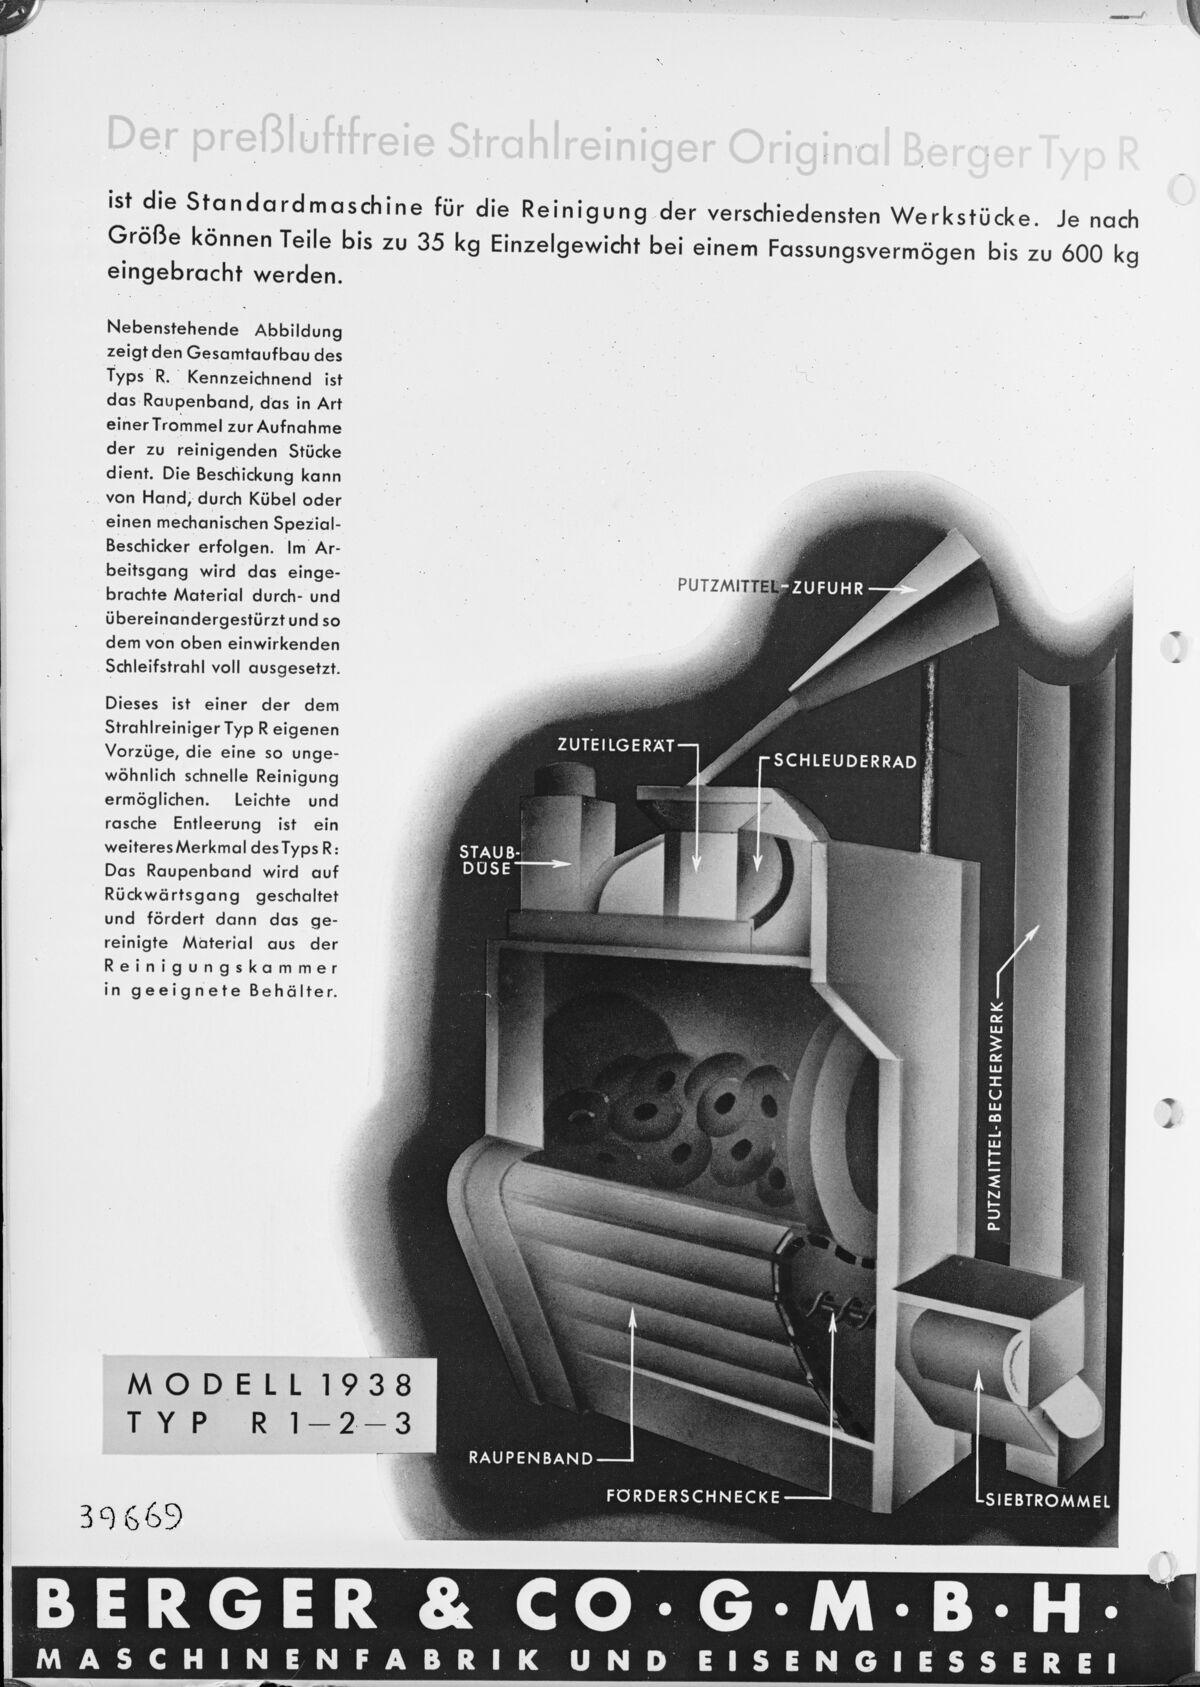 GFA 16/39669: Steel cleaner Berger